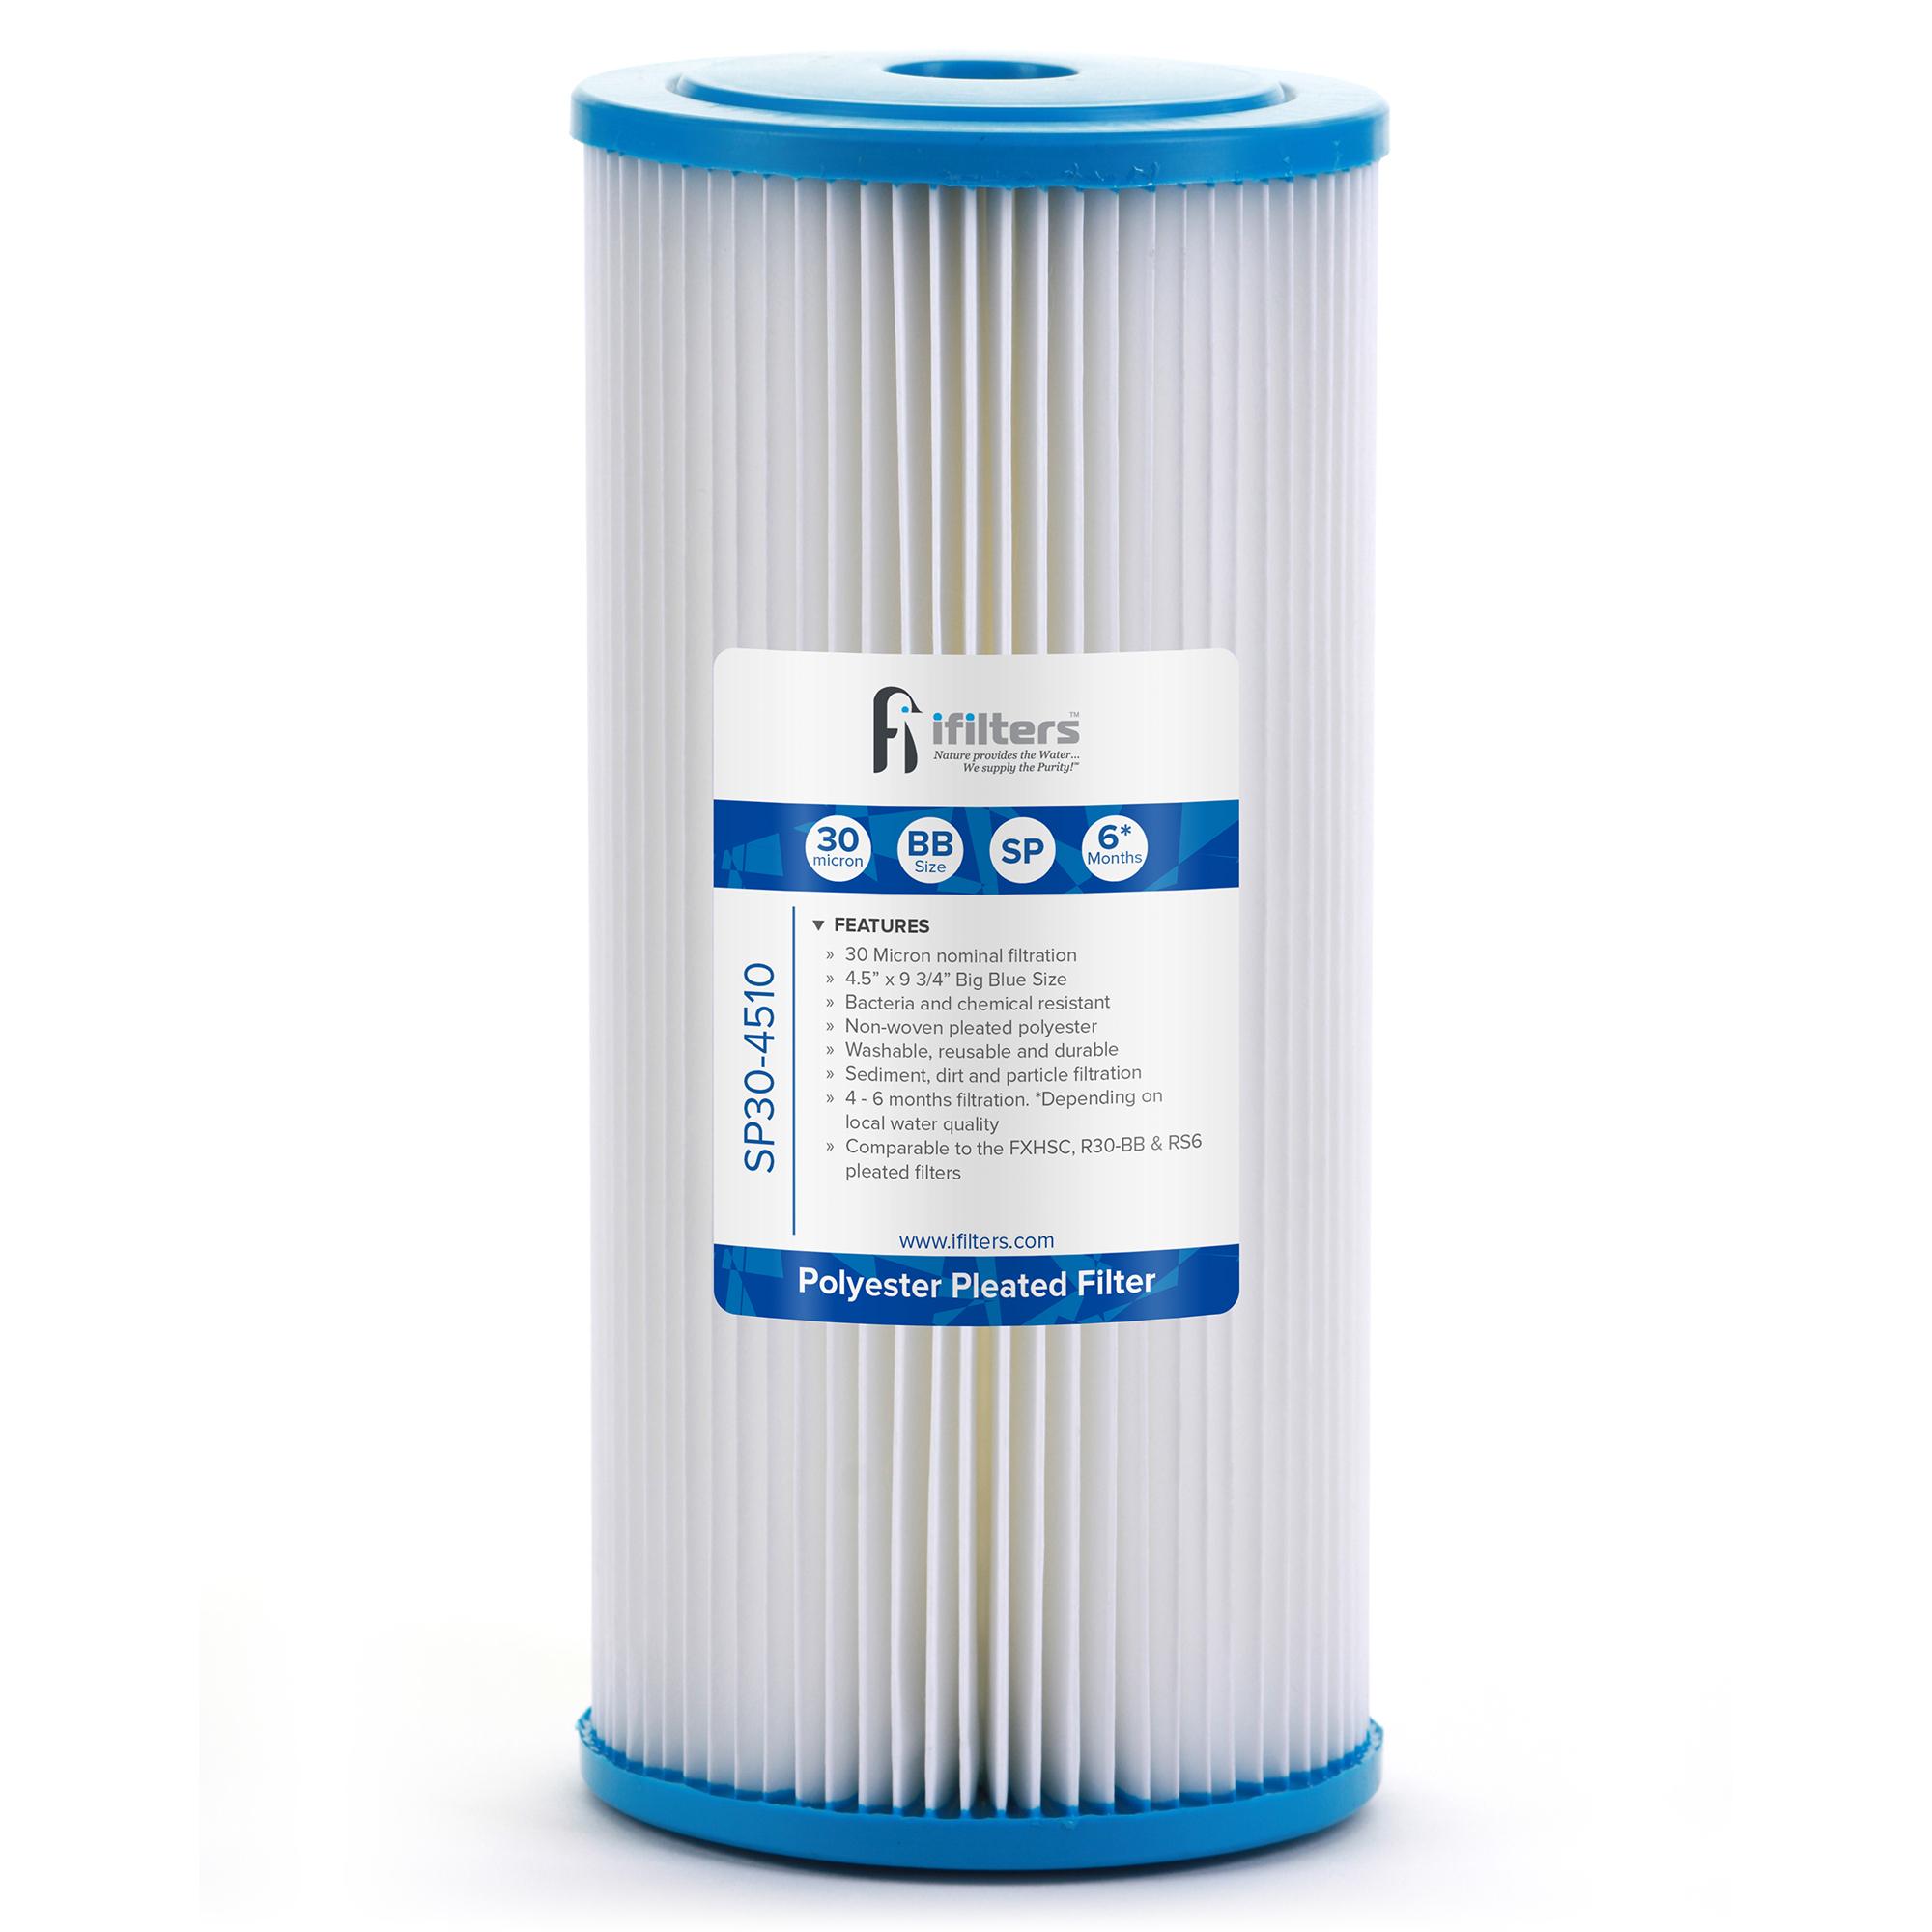 US Water 2.5 x 20 Pleated Filter Cartridge 0.5 Micron